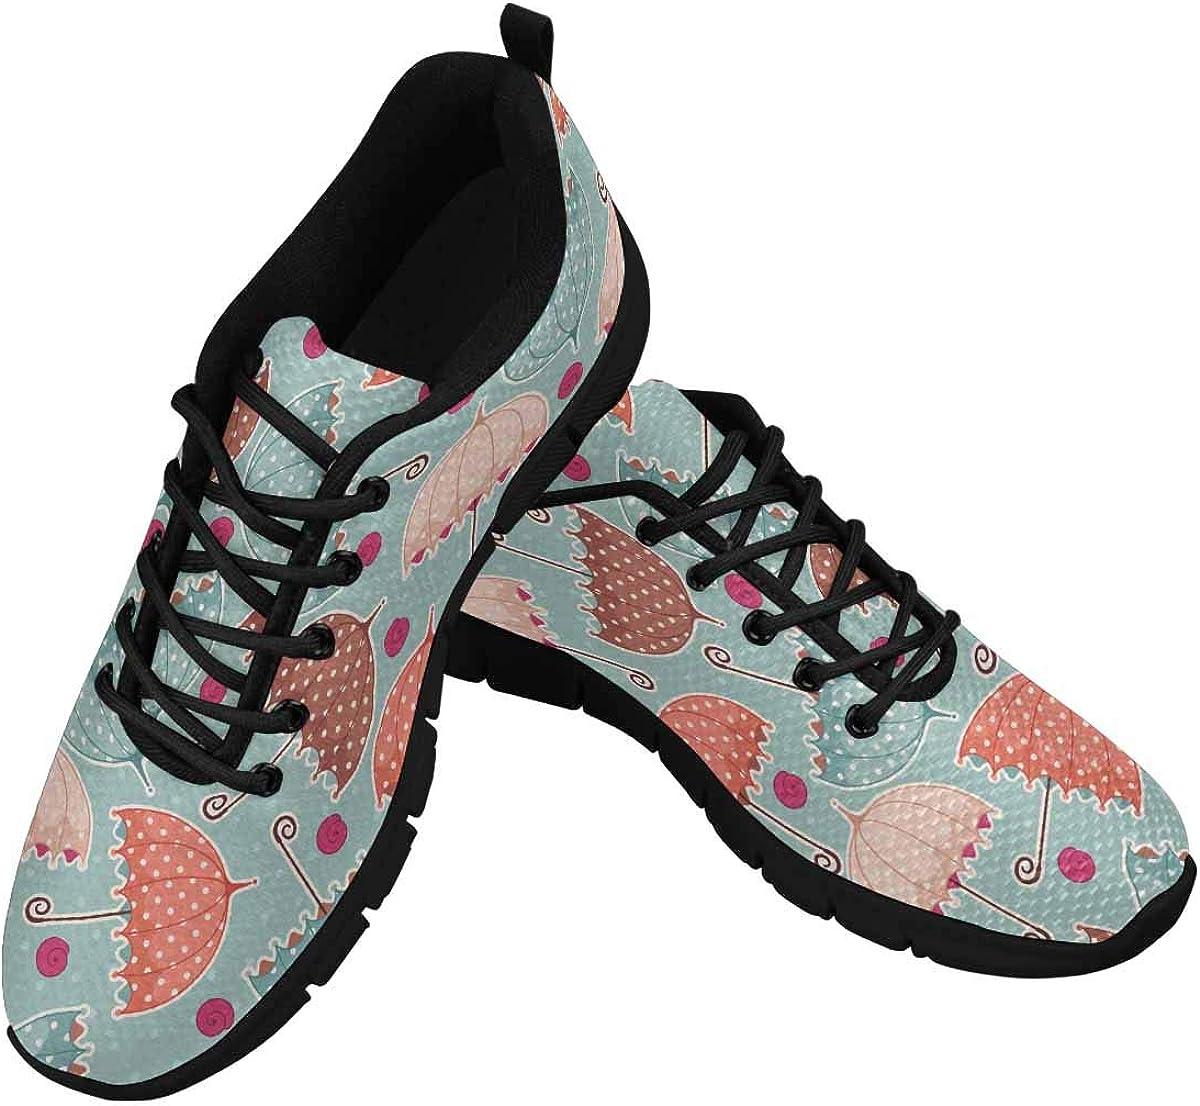 INTERESTPRINT Umbrellas Pattern Women's Athletic Walking Running Sneakers Comfortable Lightweight Shoes